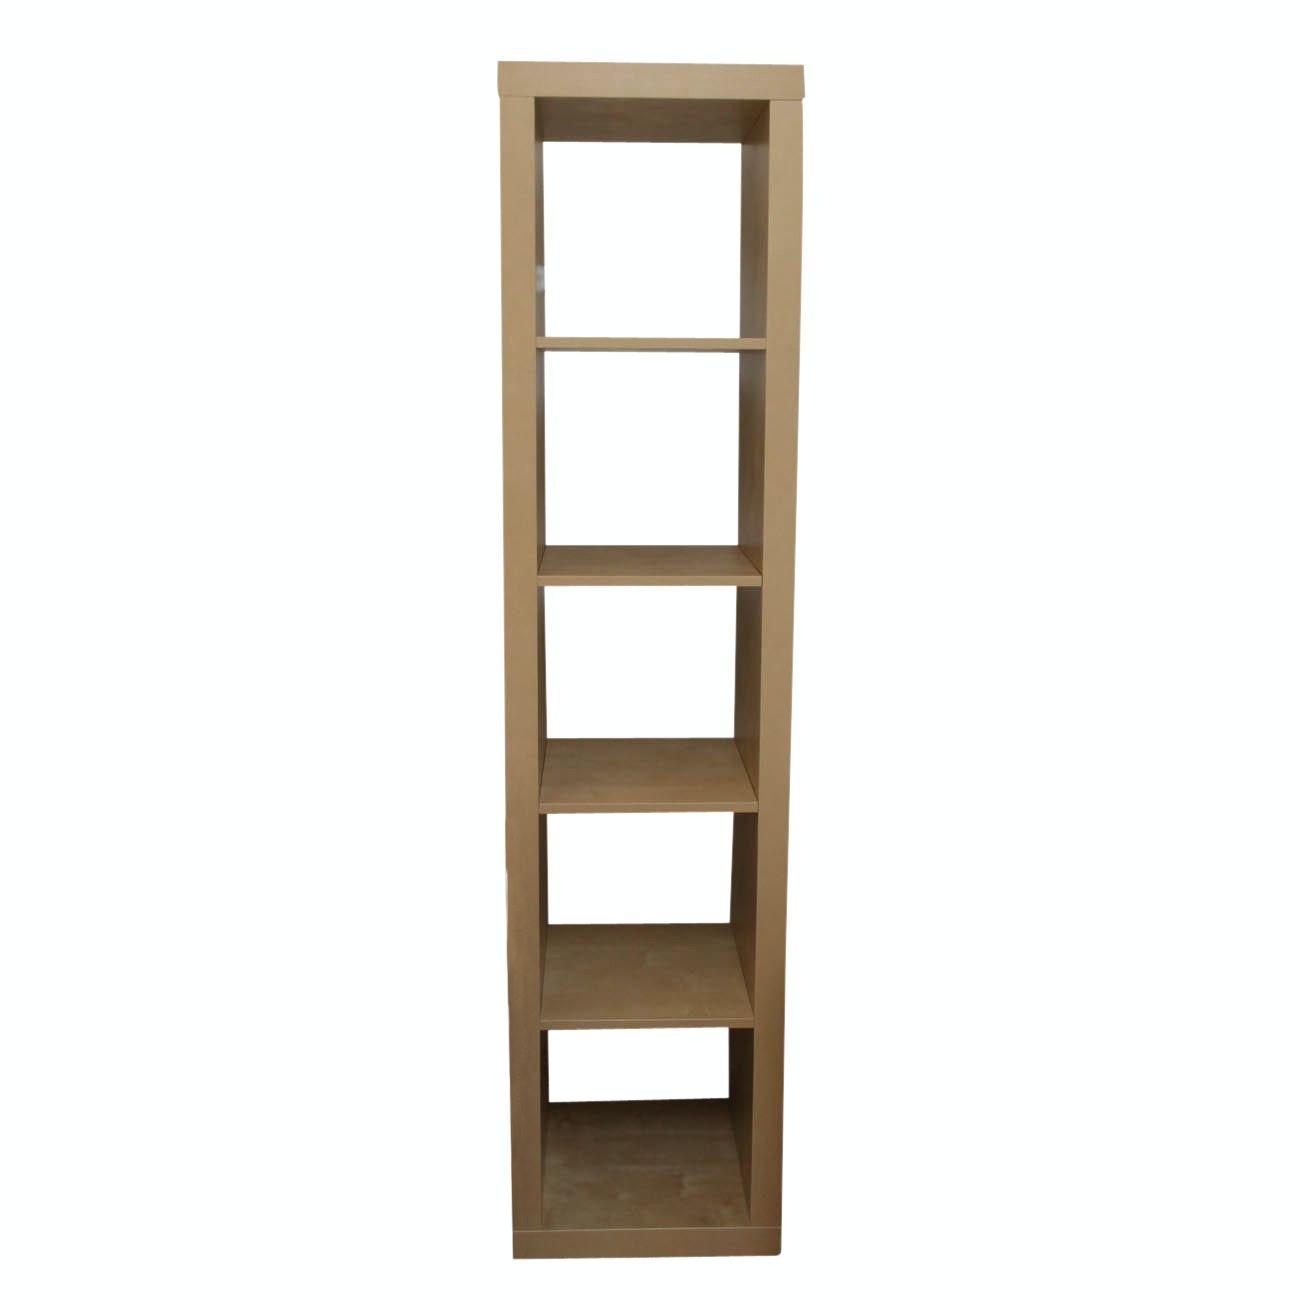 Open Back Bookcase or Display Cabinet with Oak Veneer